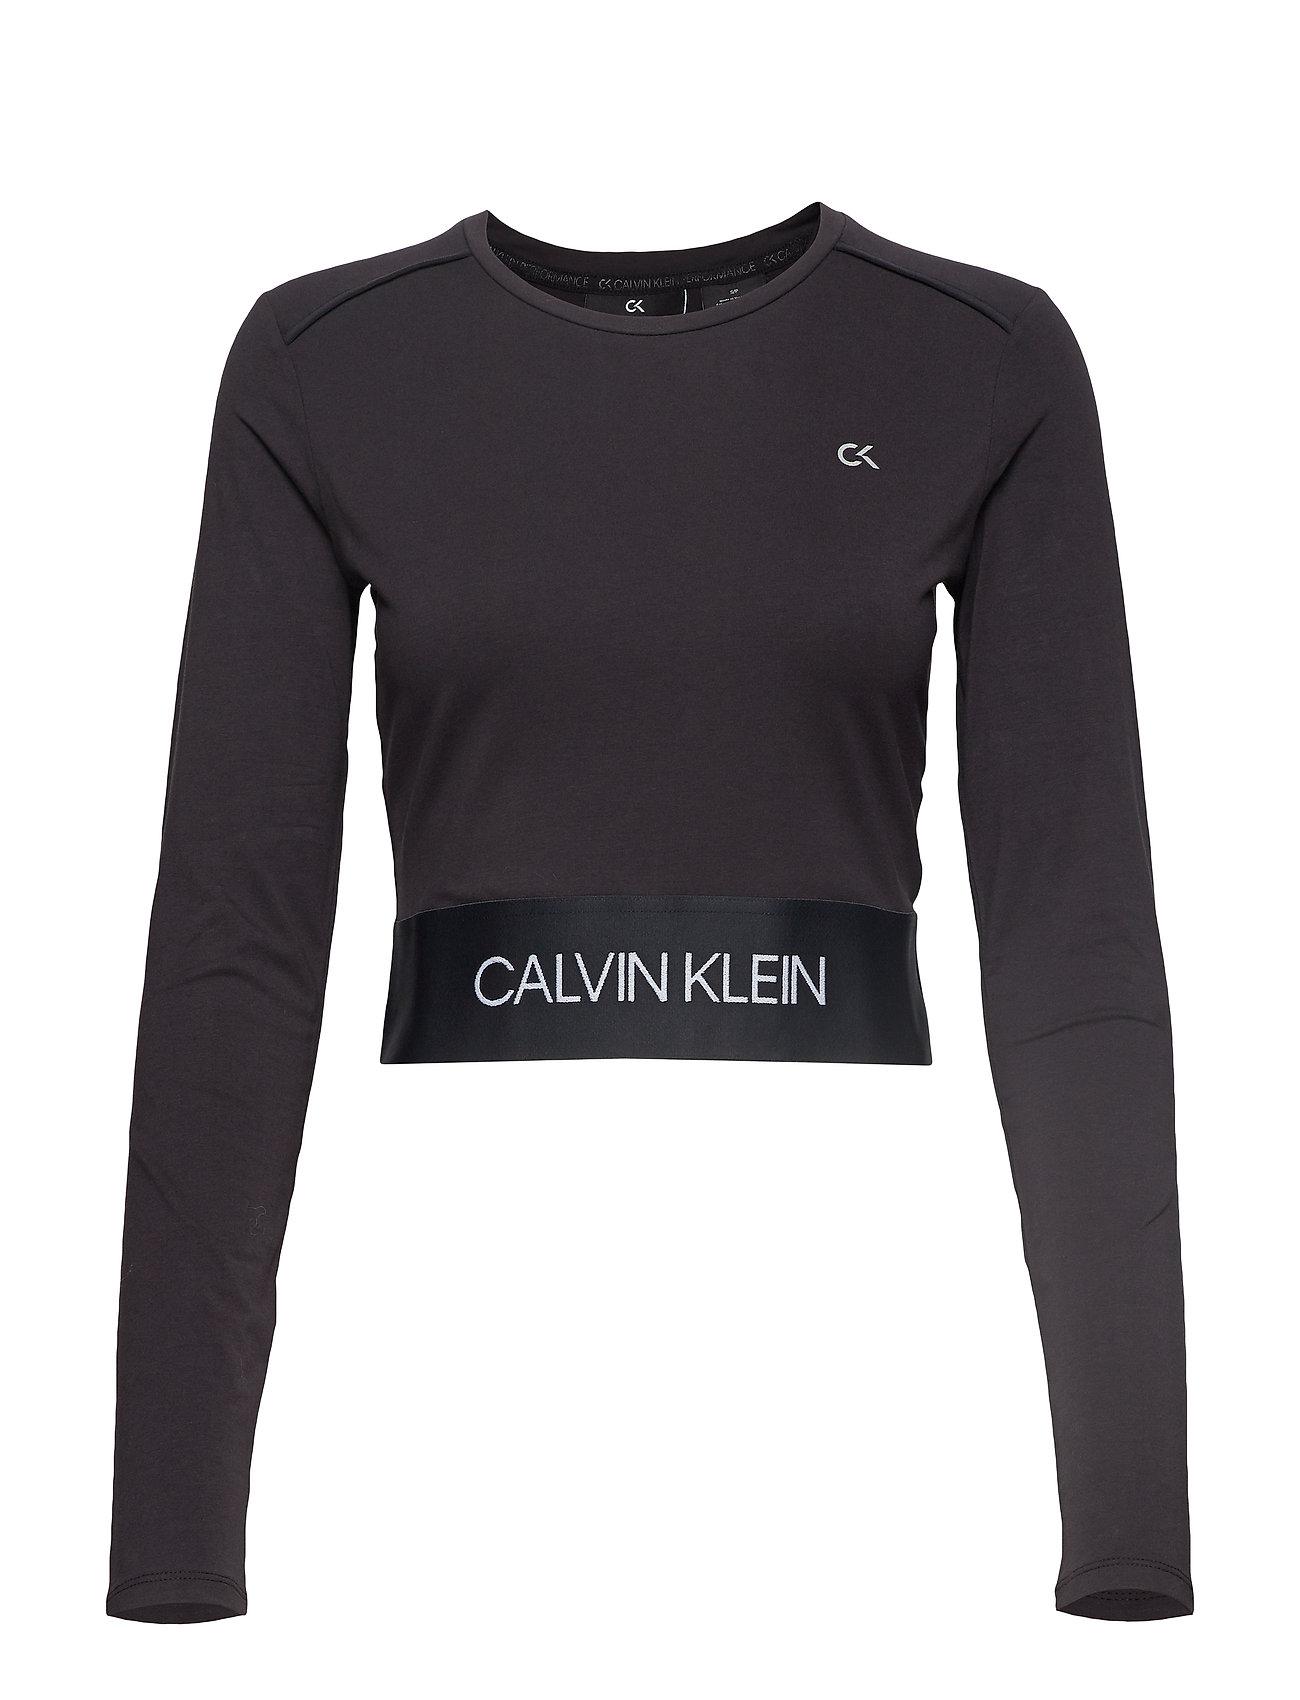 Calvin Klein Performance LONG SLEEVE TEE - CK BLACK